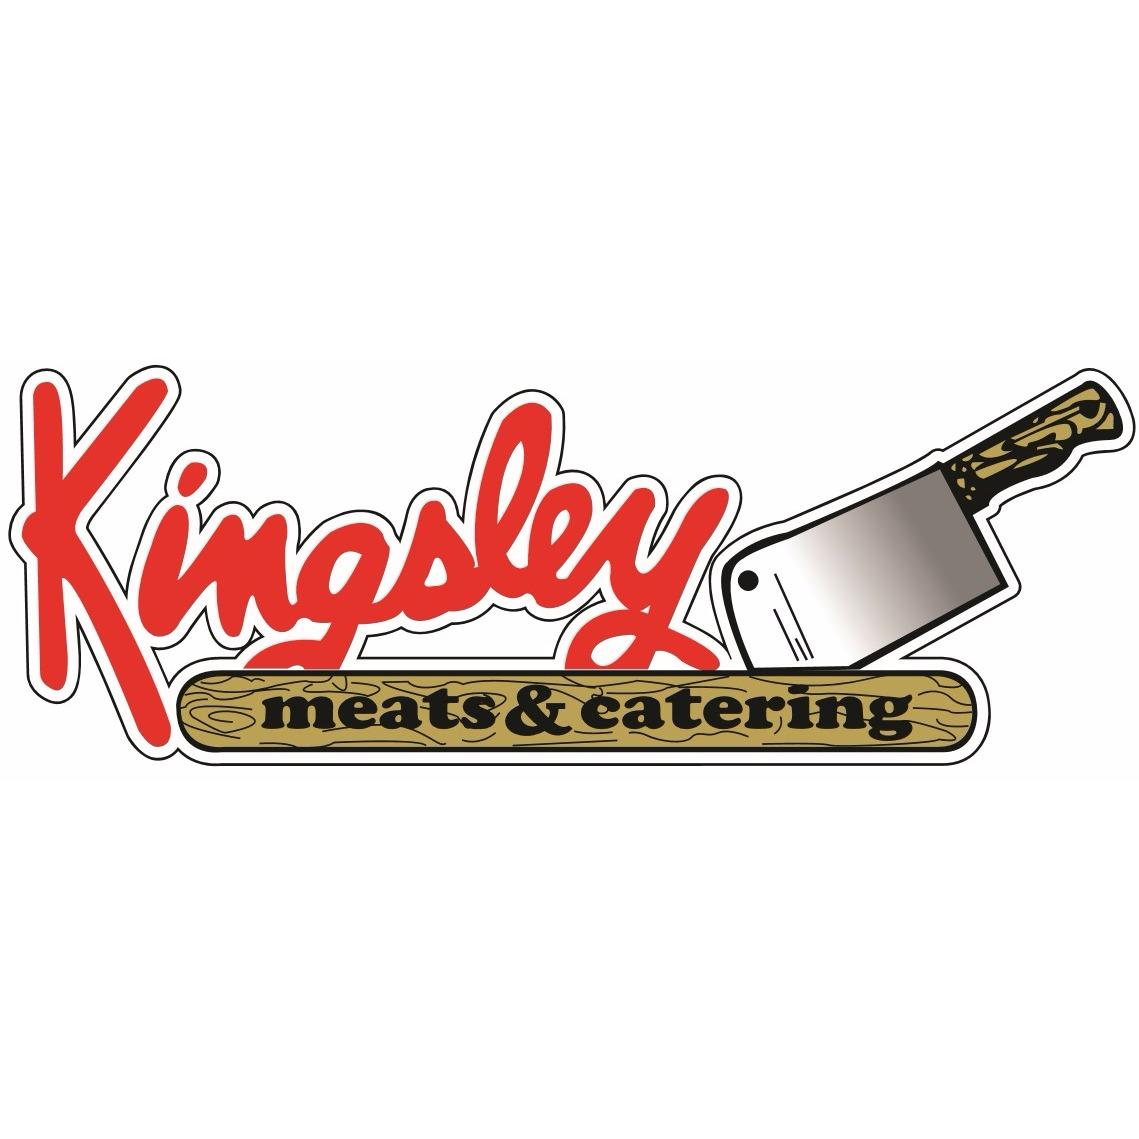 Kingsley Meats & Catering